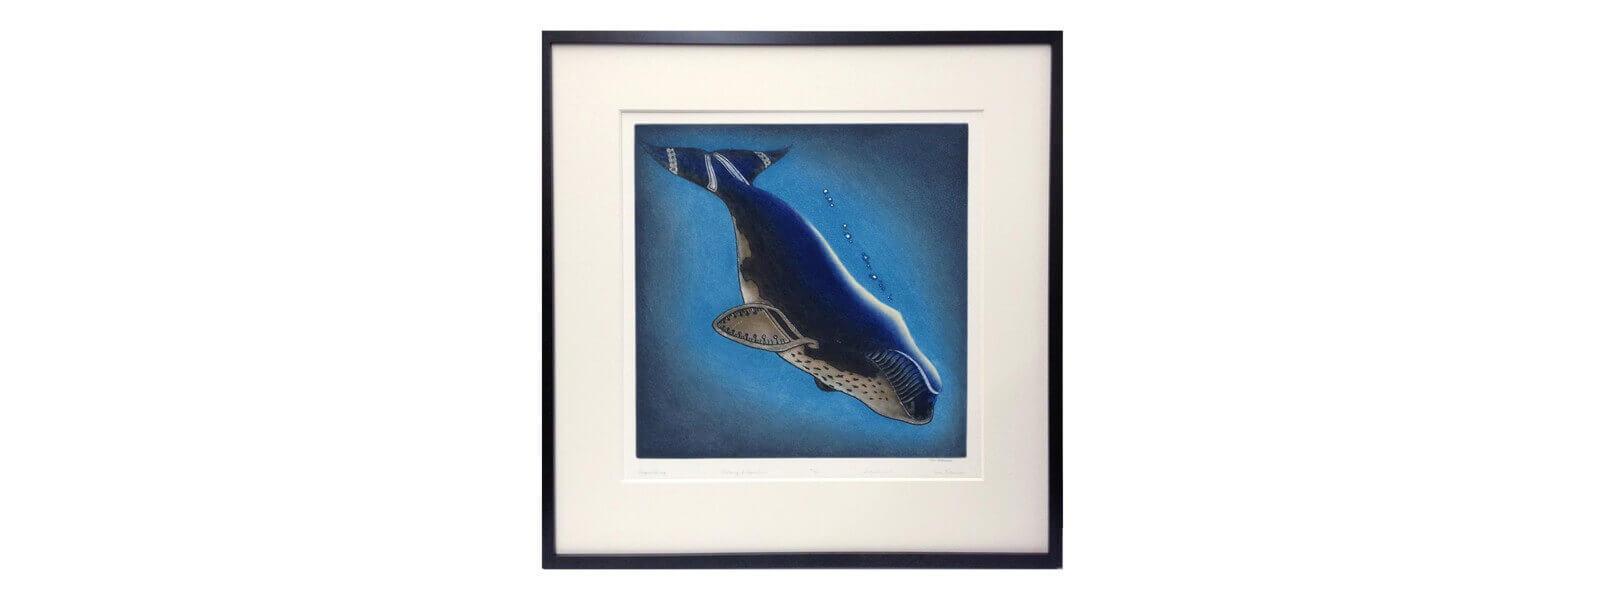 HS-pitsiulak-whale-art